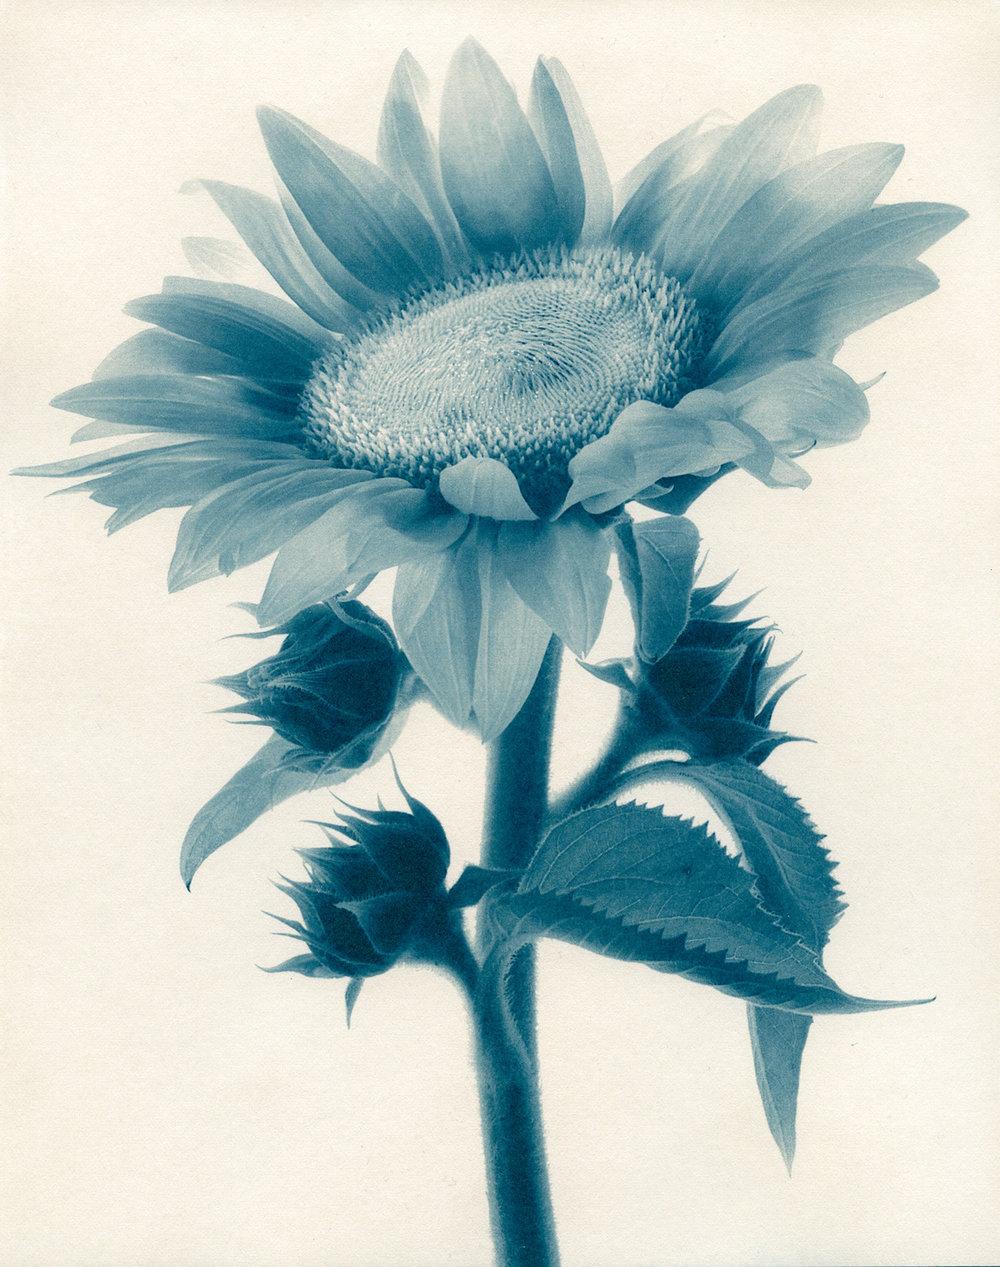 Cyan-Sunflower-1900x1500x72dpi-Sq.jpg